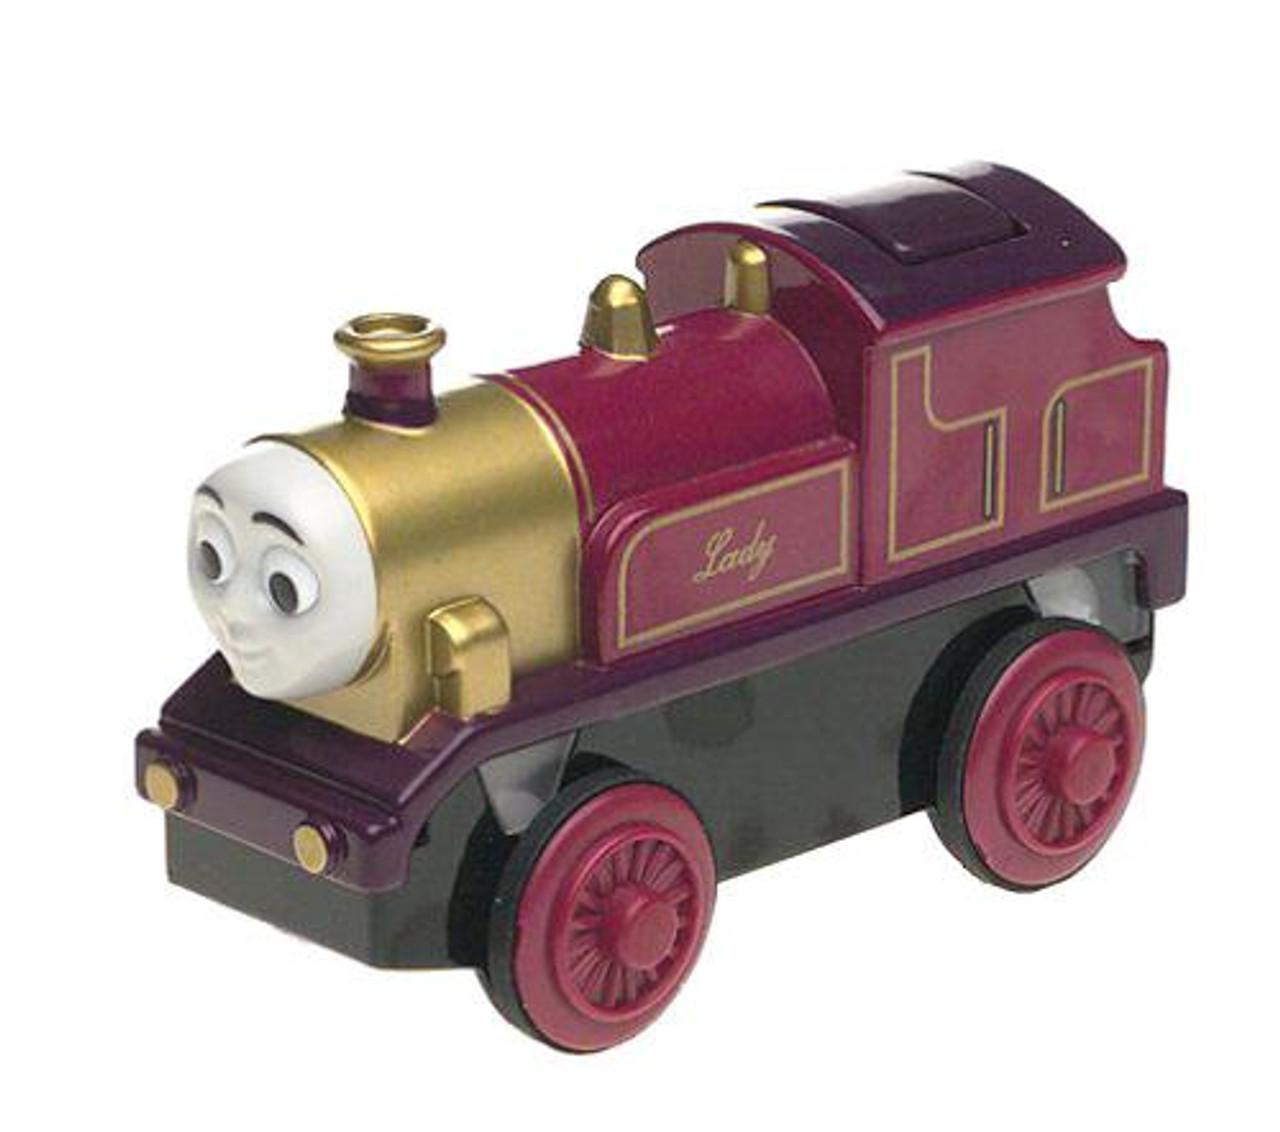 Thomas & Friends Wooden Railway Lady Train